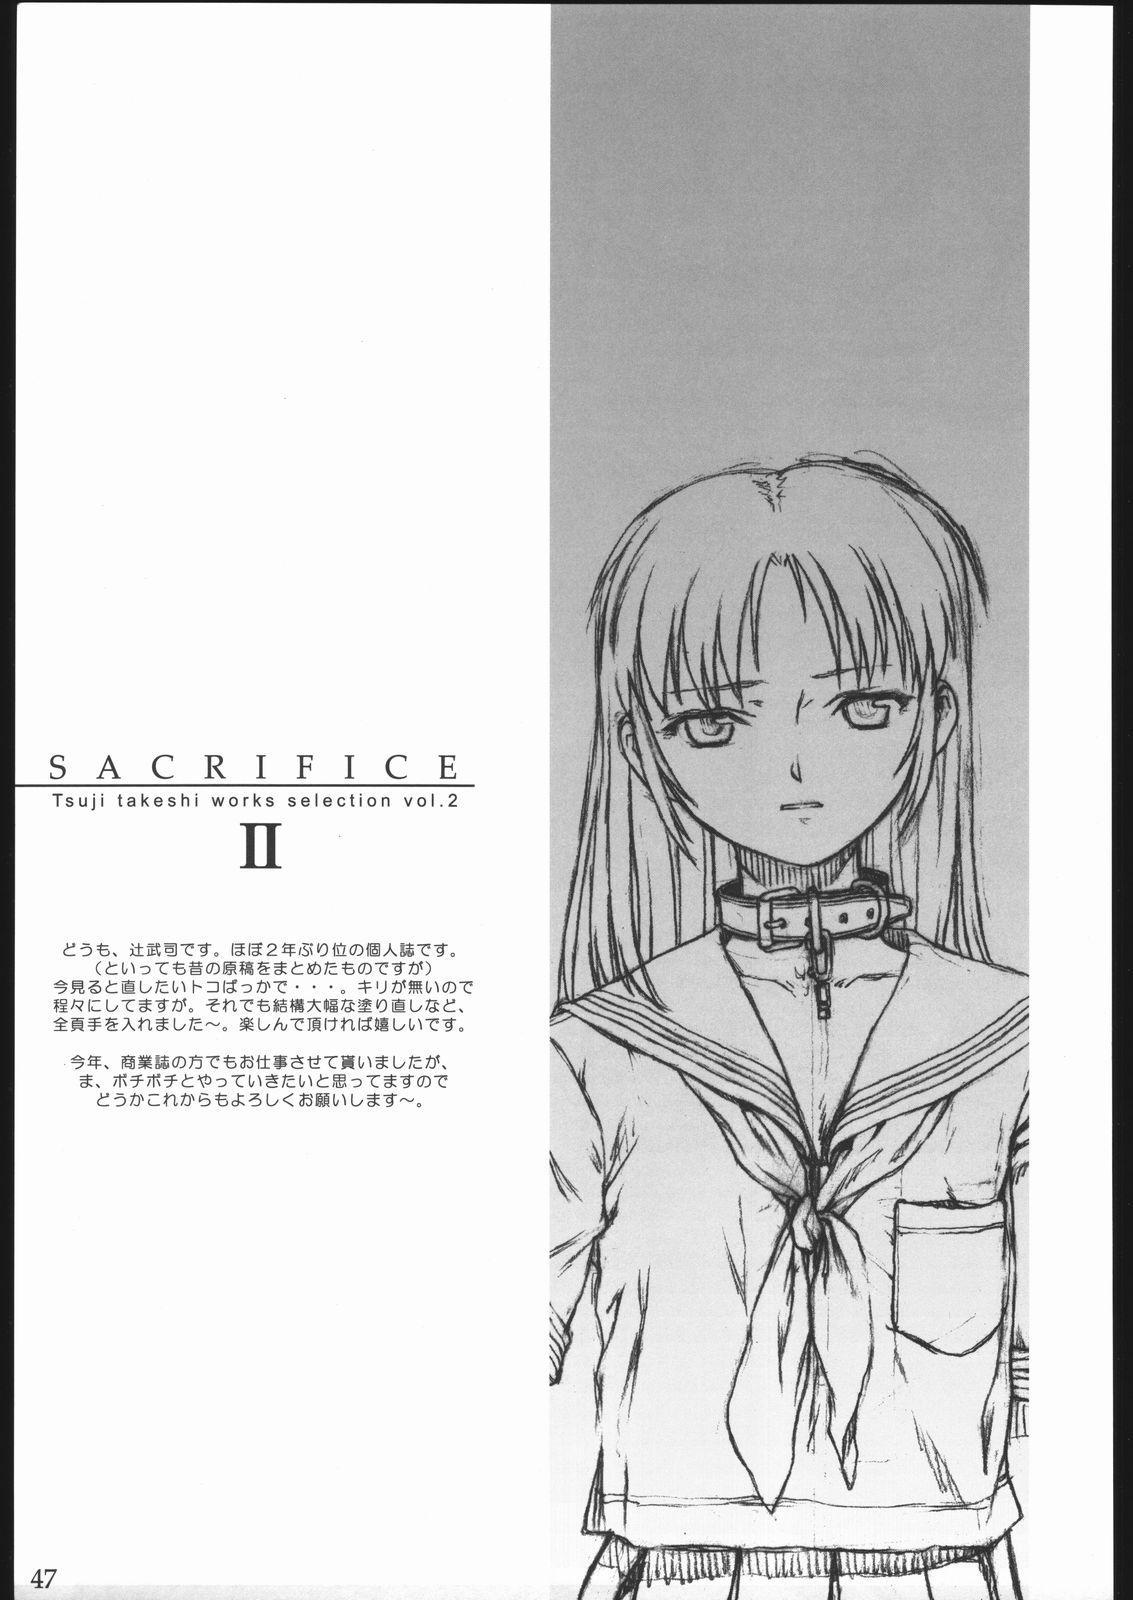 SACRIFICE Tsuji Takeshi Works Selection vol. 2 44